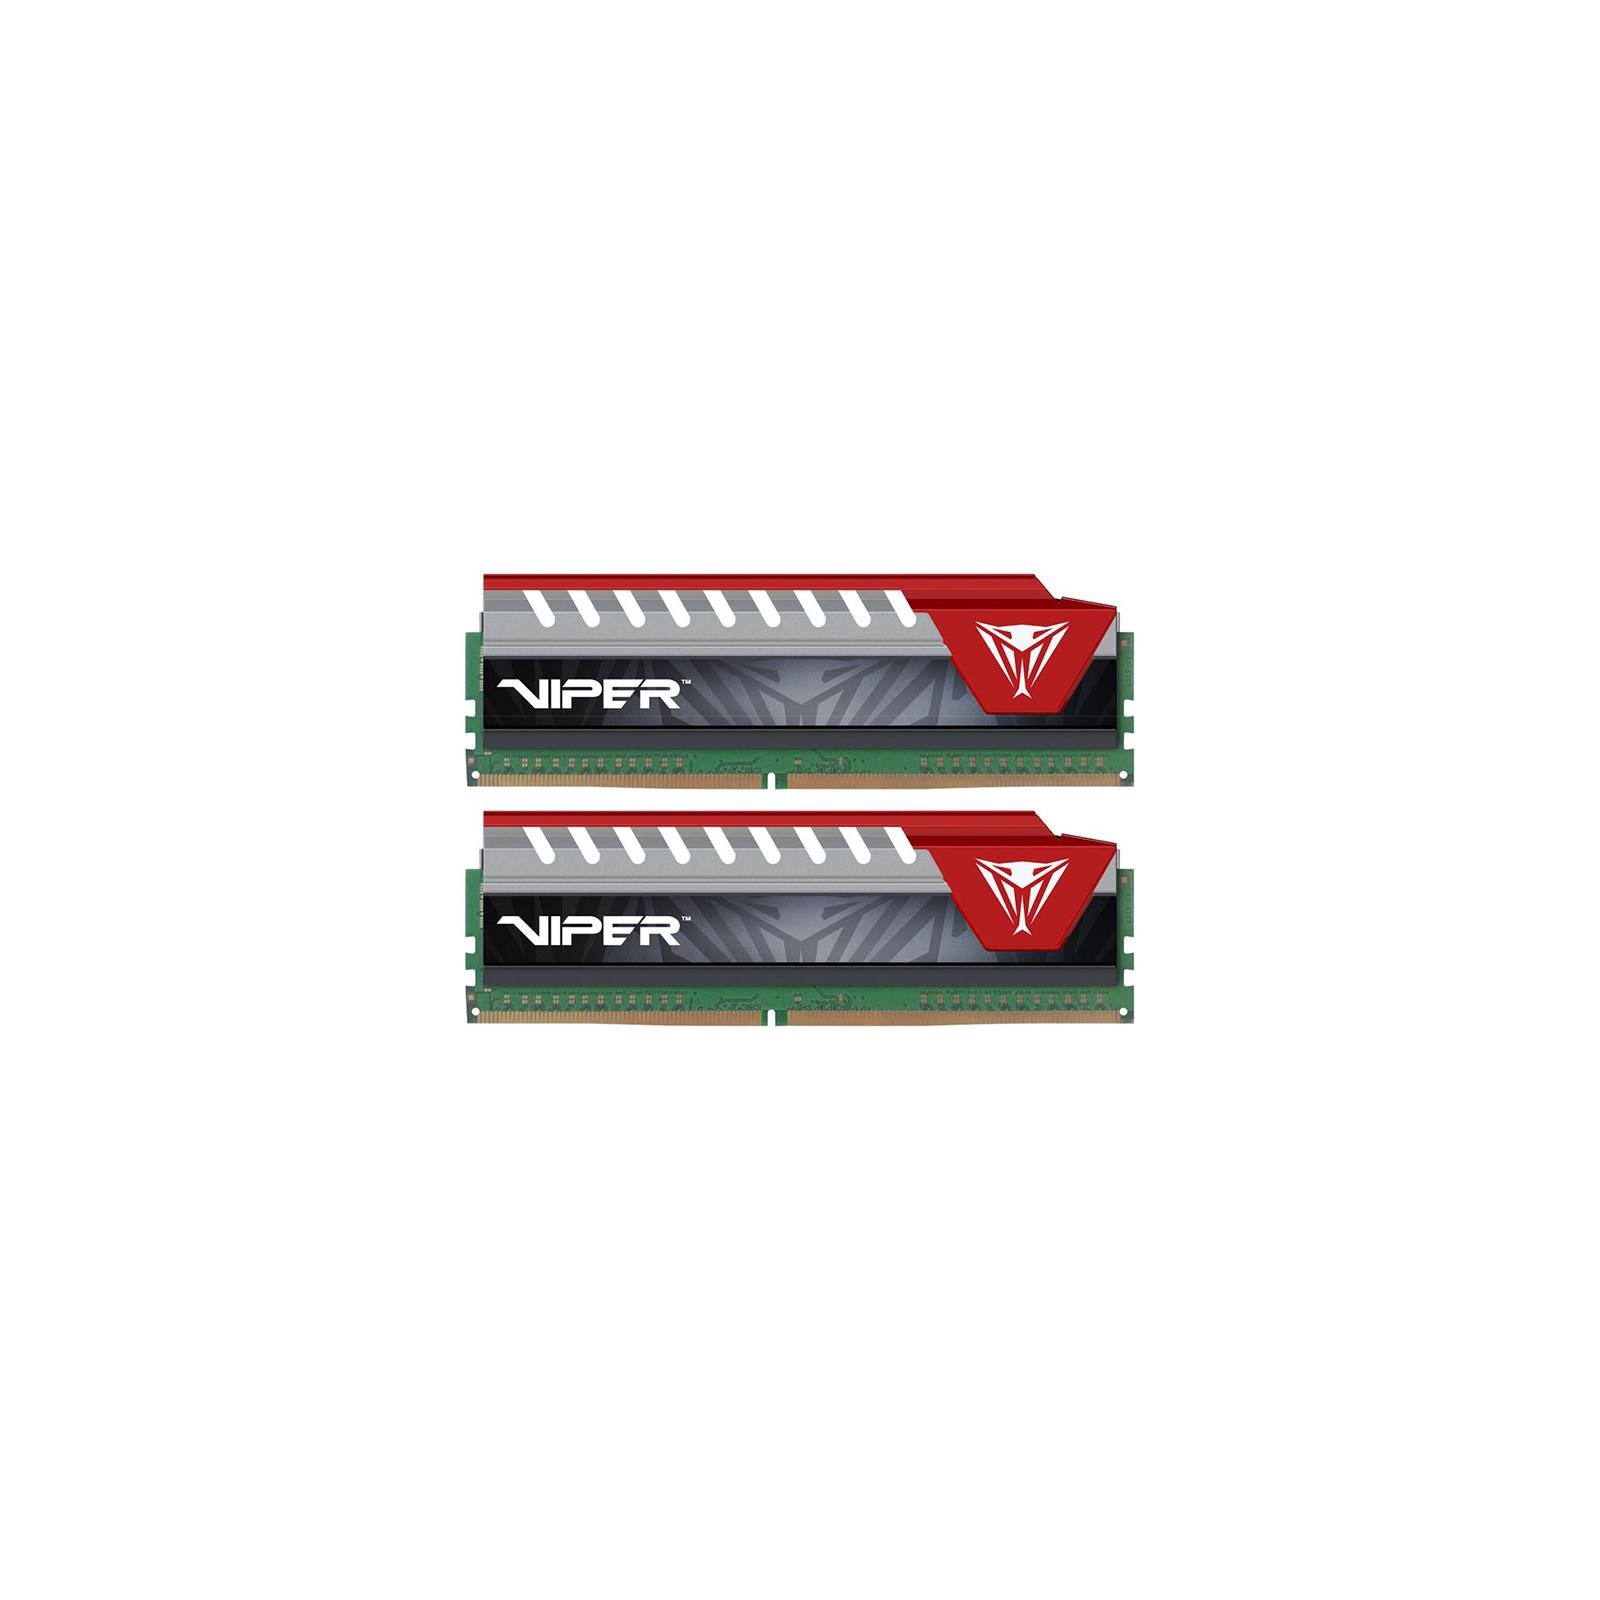 Модуль памяти для компьютера DDR4 32GB (2x16GB) 2400 MHz Original V ELITE KIT BLK/RED Patriot (PVE432G240C5KRD)